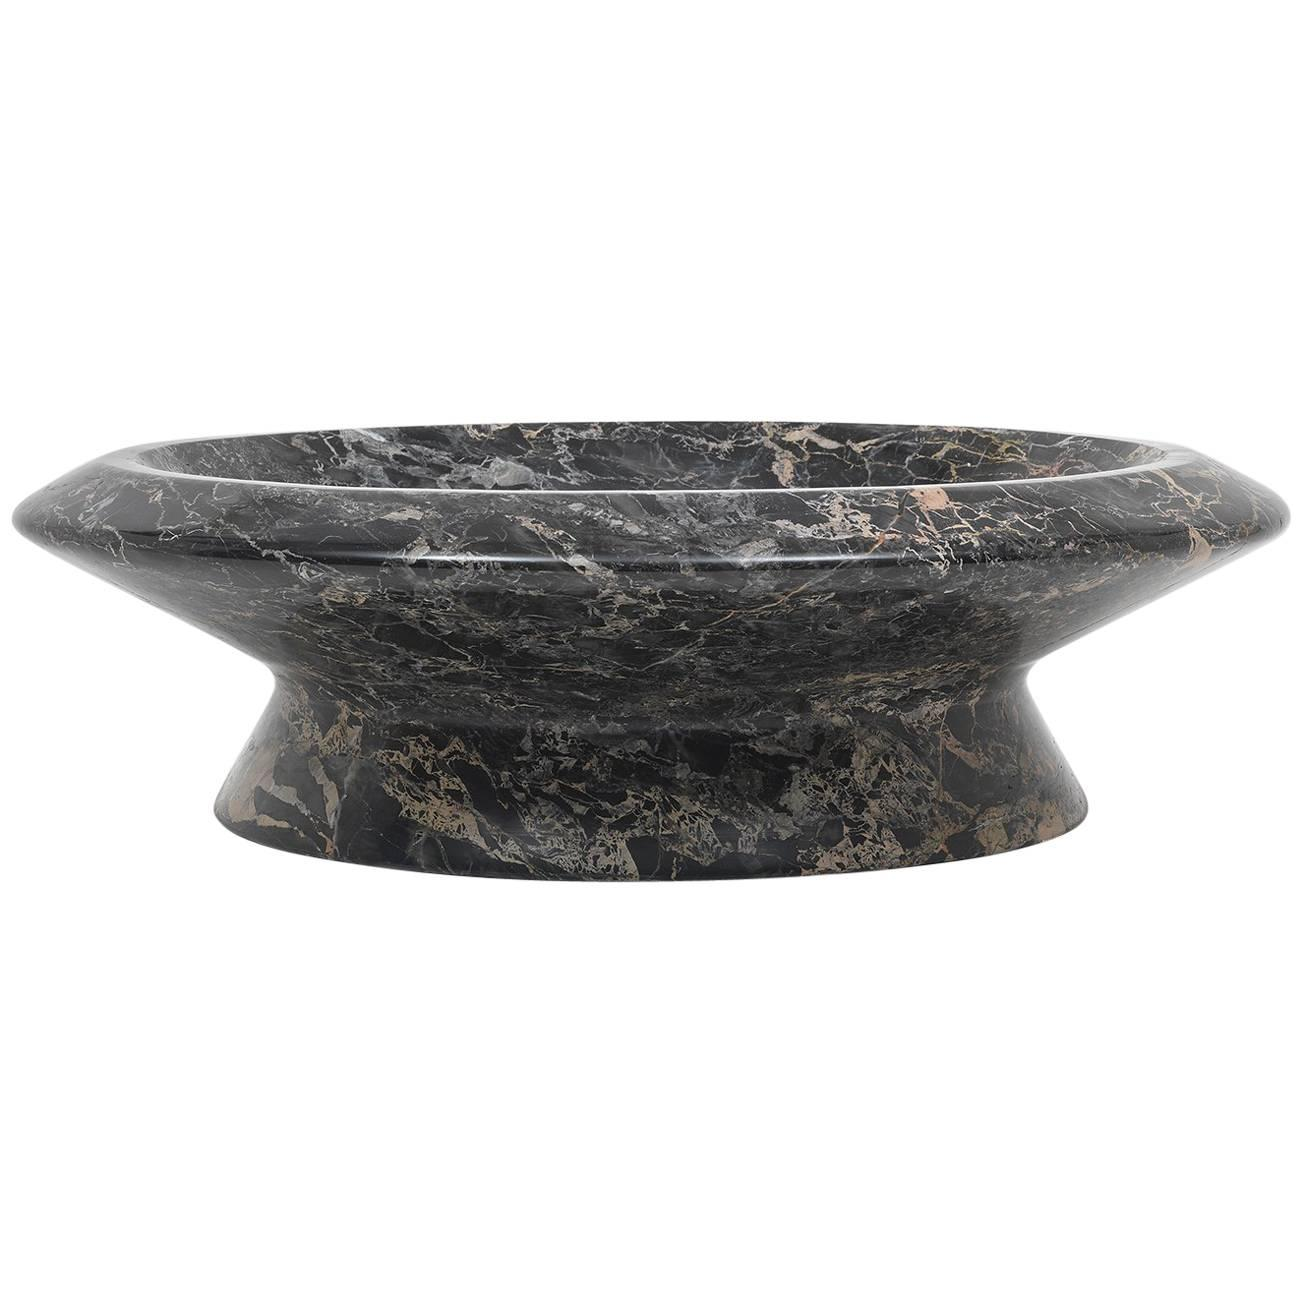 Centrepiece in Black Portoro Marble by Ivan Colominas, Italy